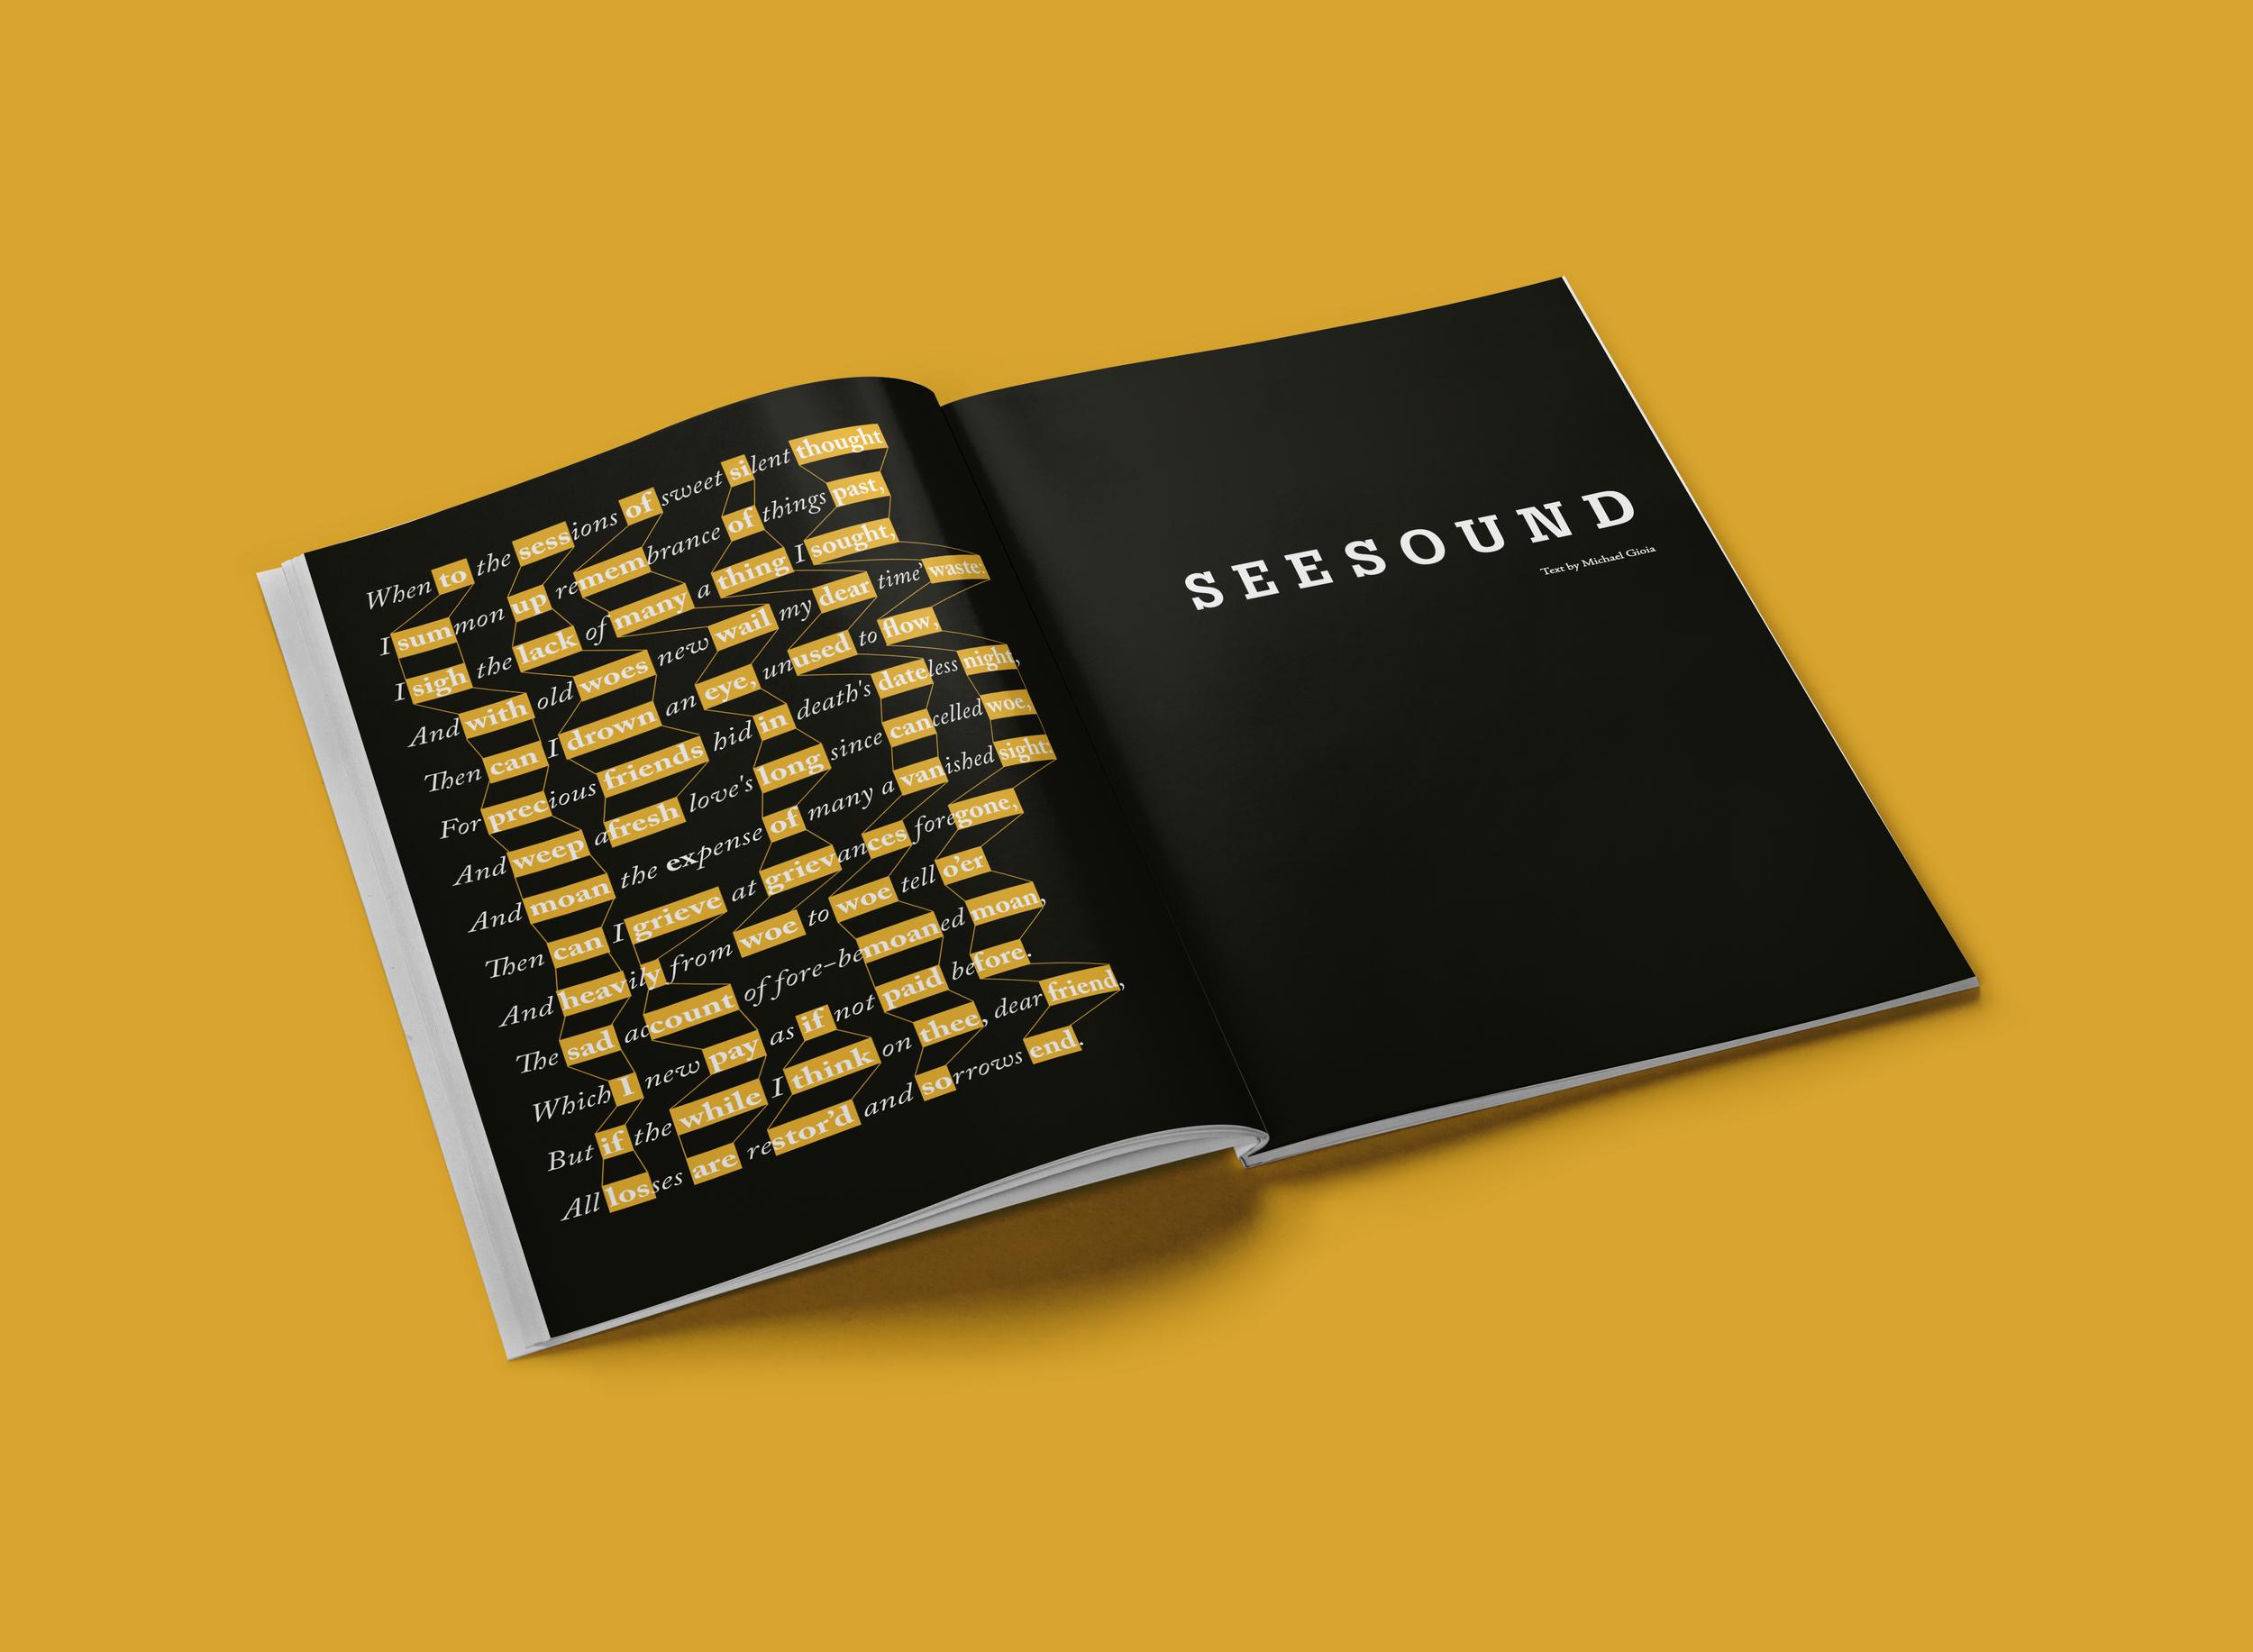 seesound_spread1.jpg